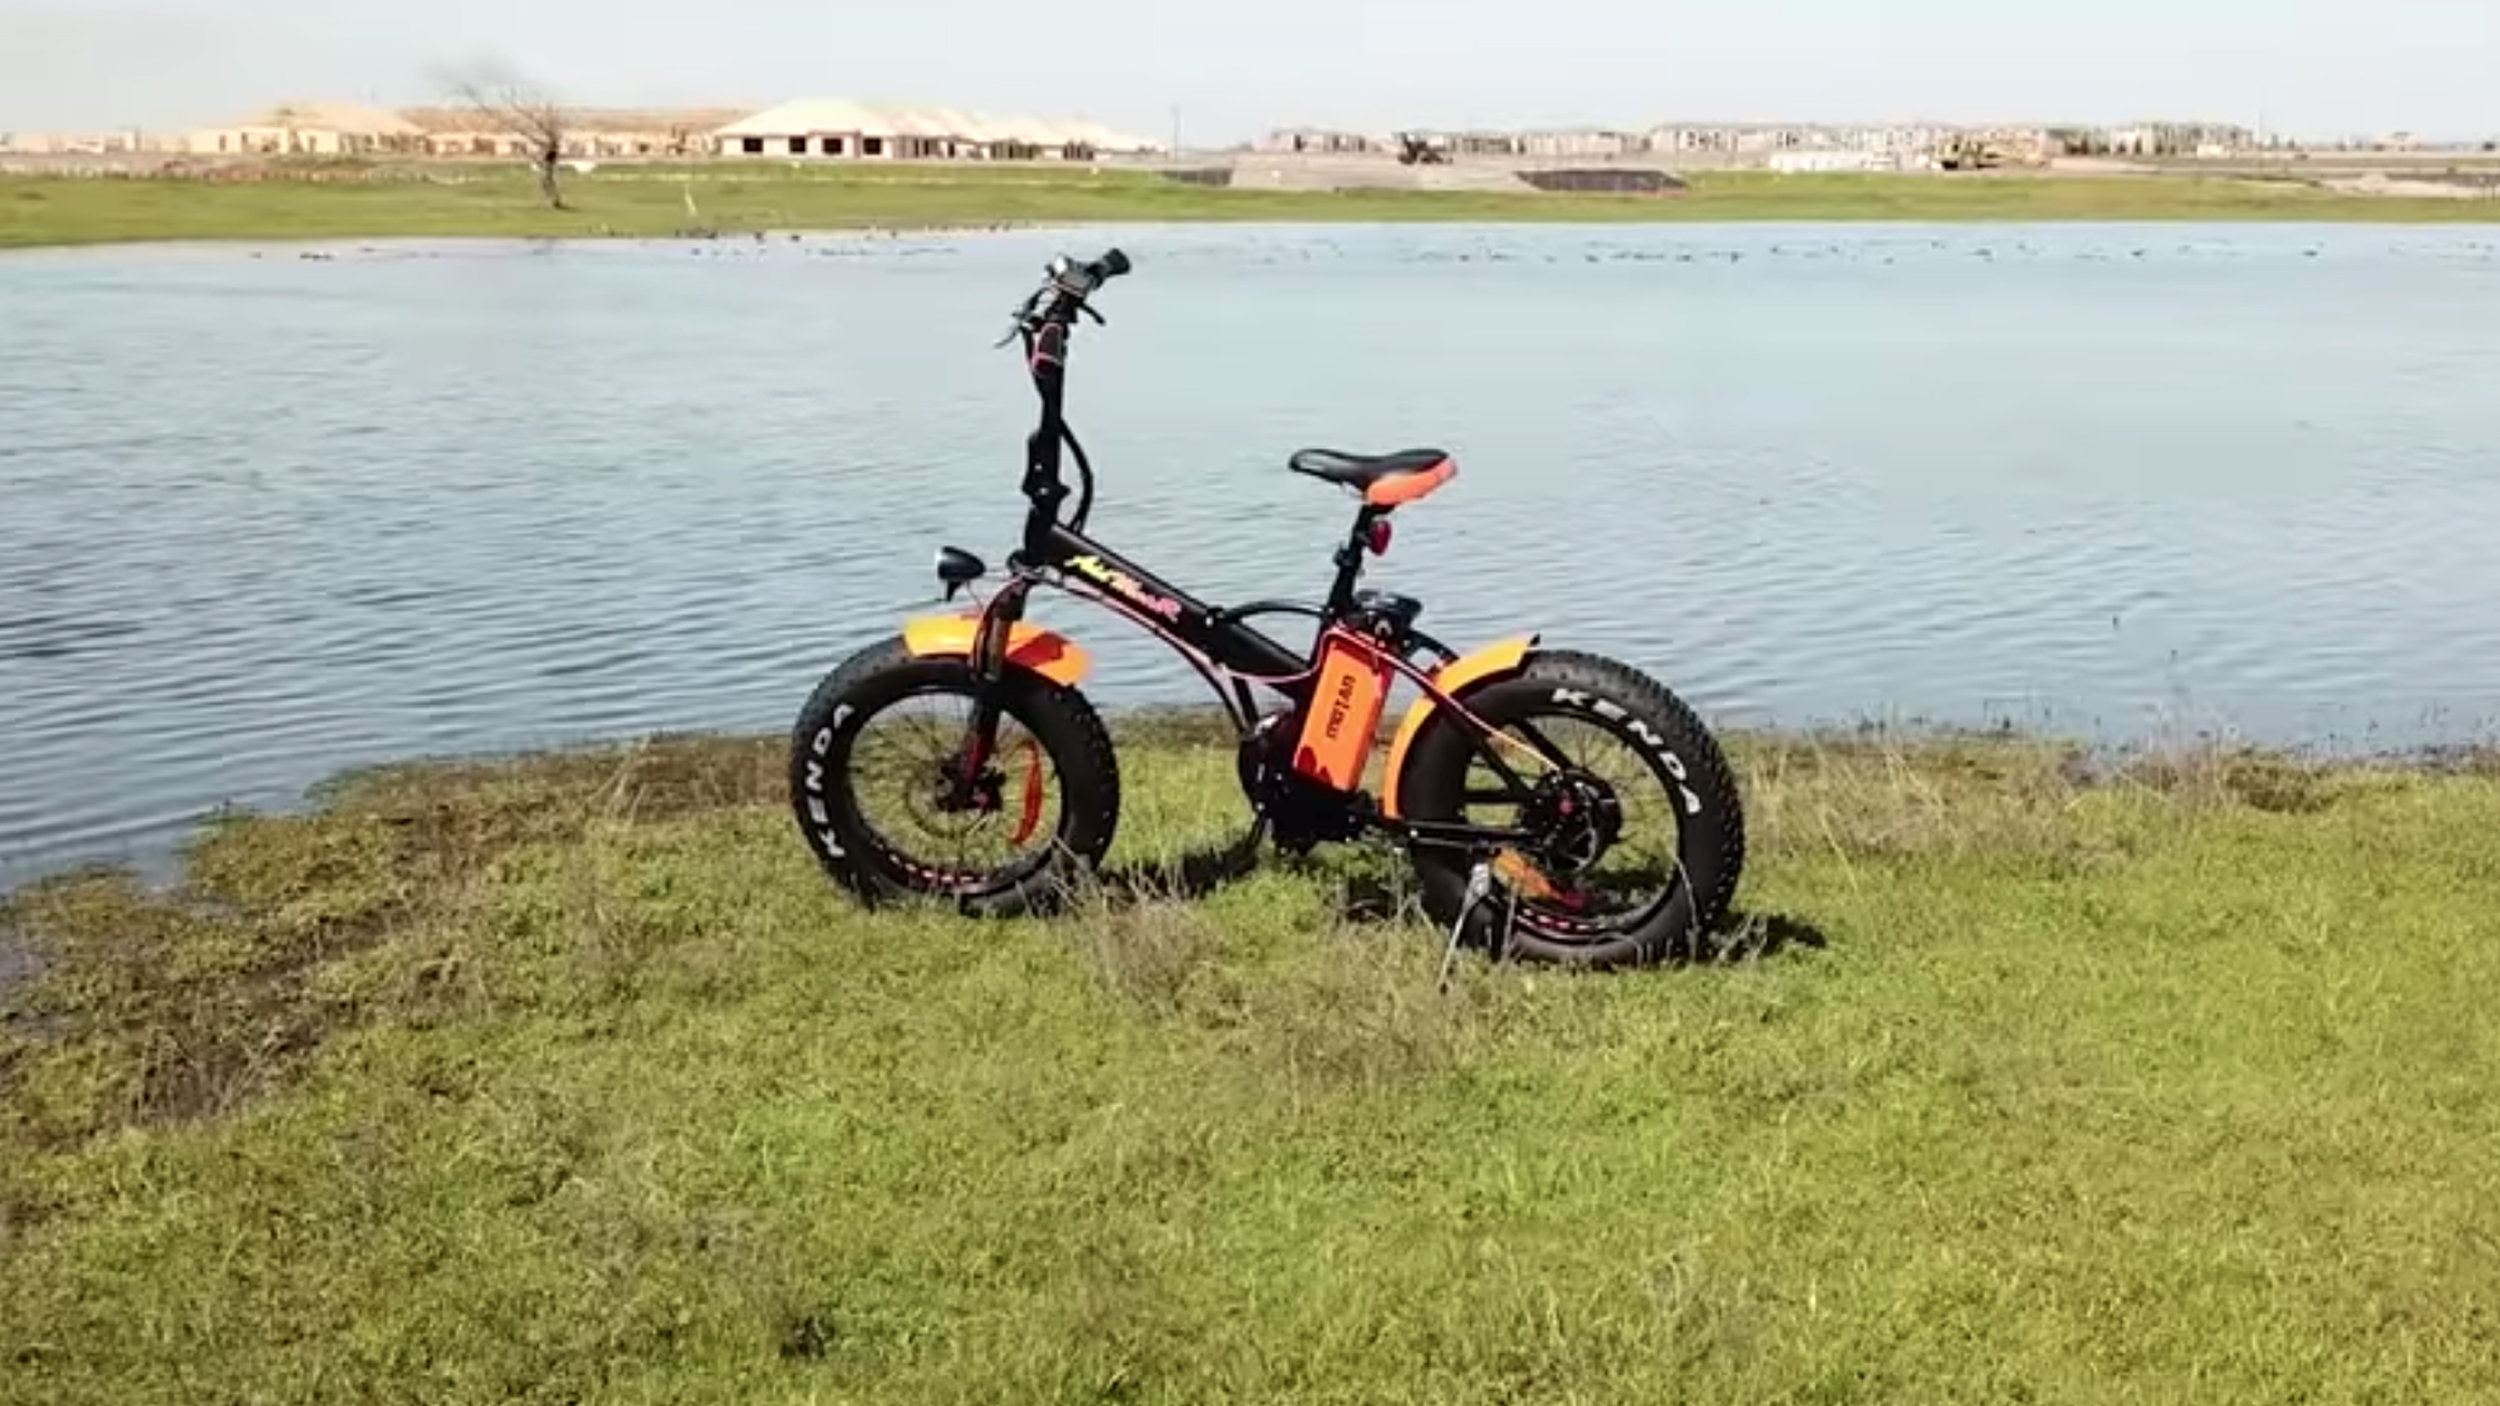 electrified-reviews-addmotor-motan-m150p7-electric-bike-review-profile-wide.jpg